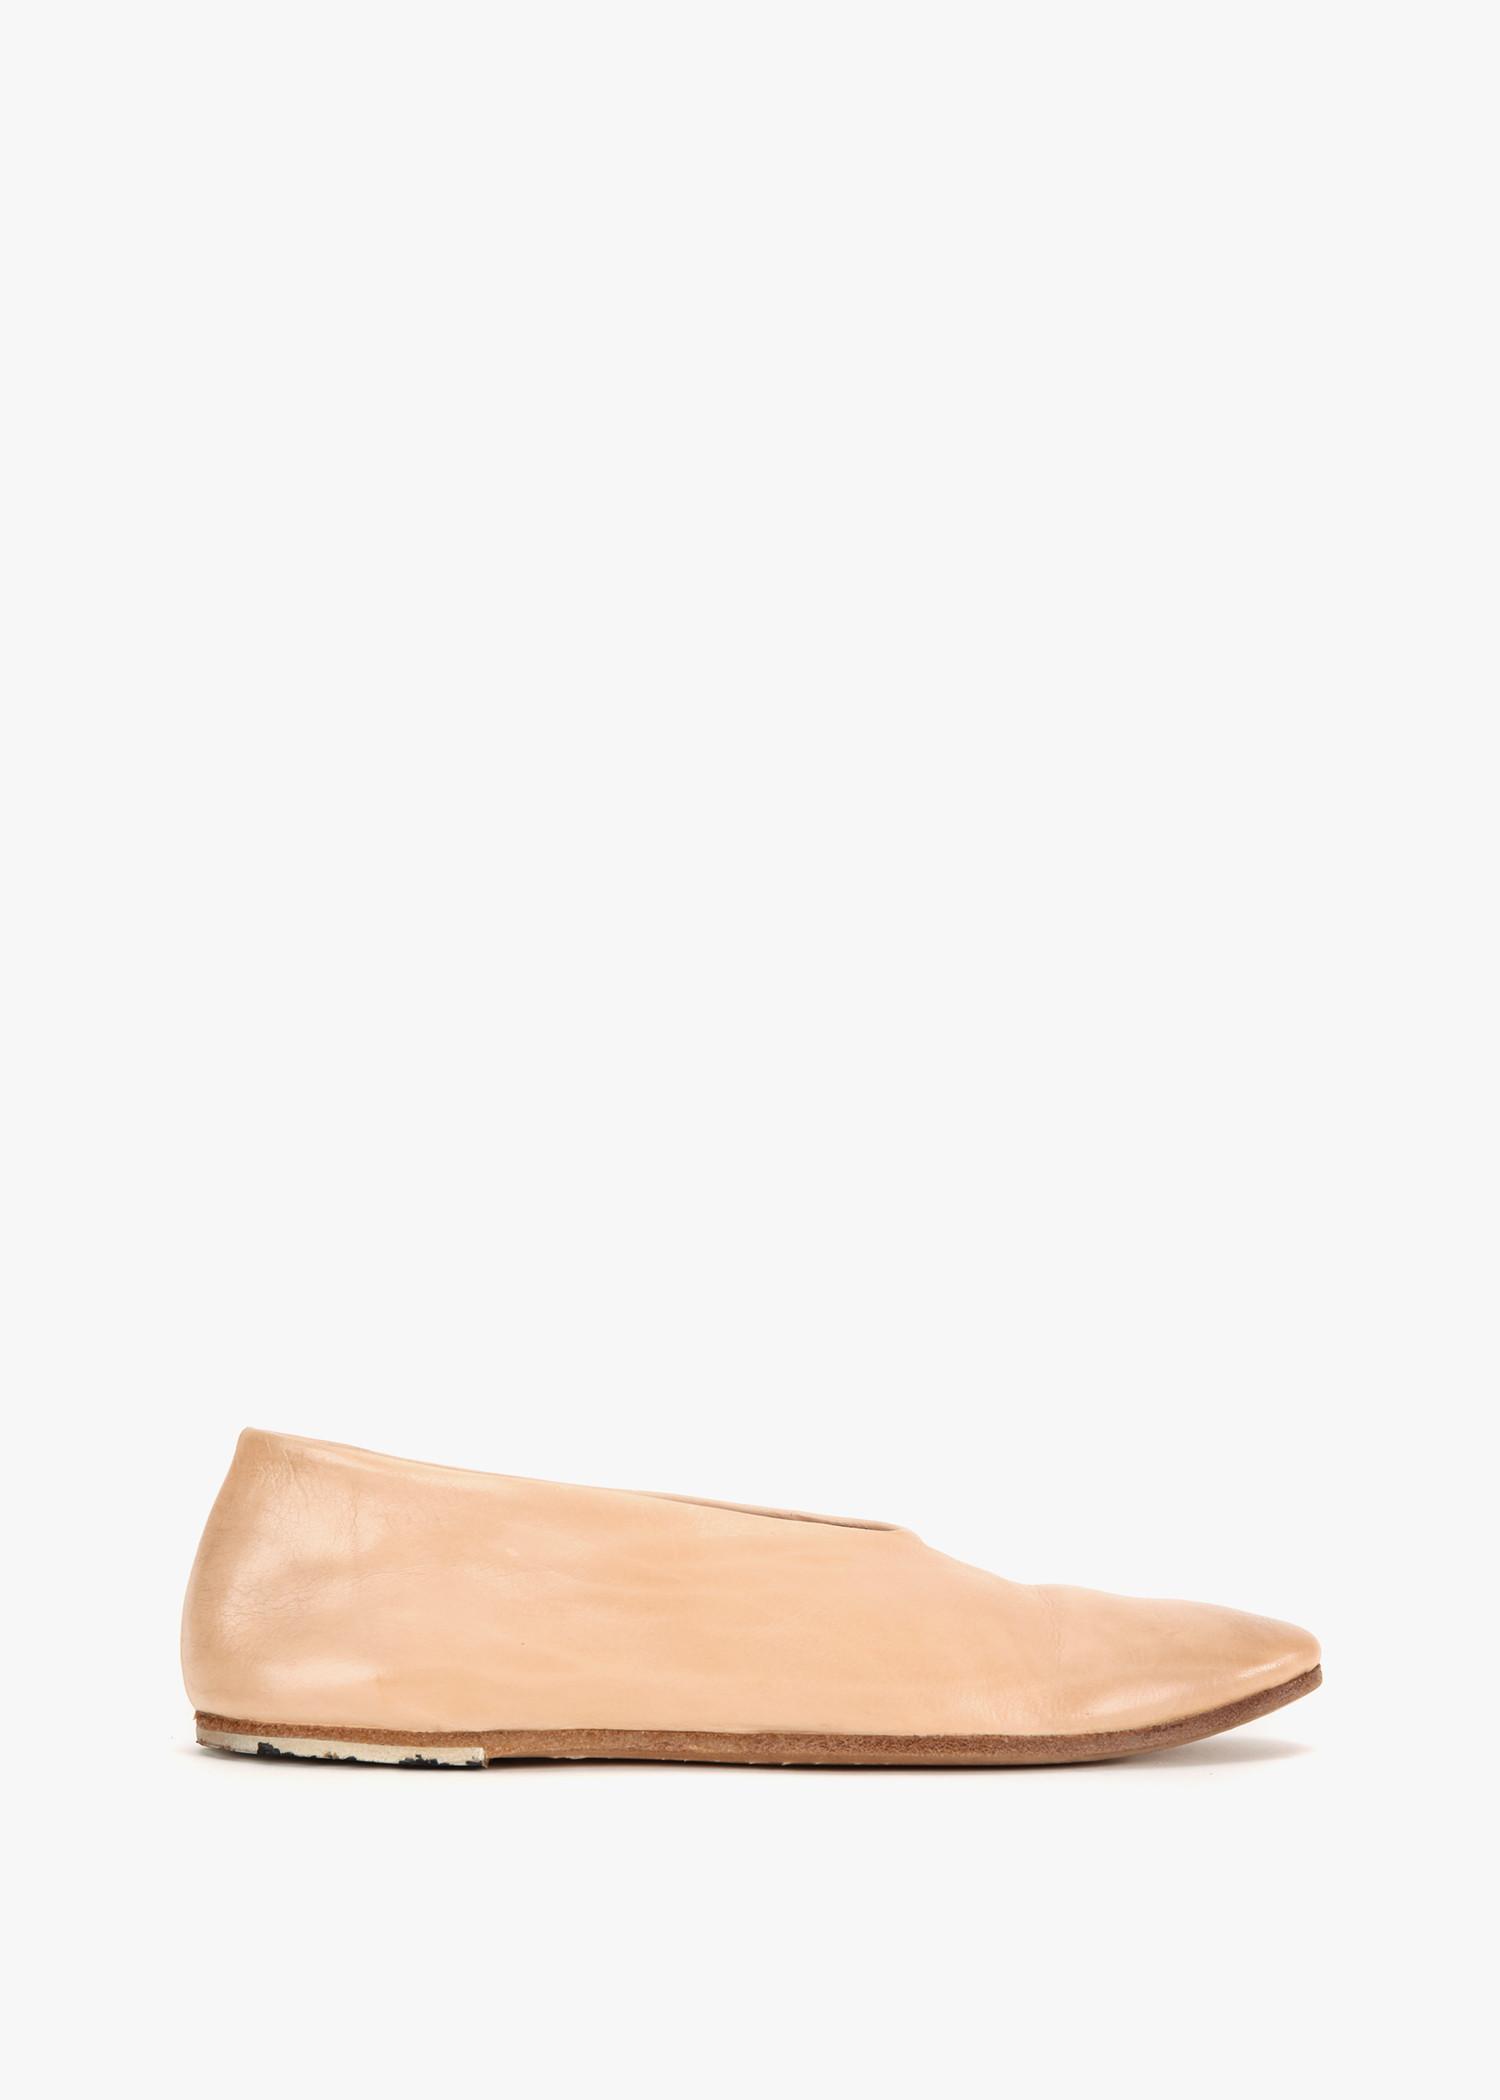 MarsÈLl Leather Flats In Dark Beige